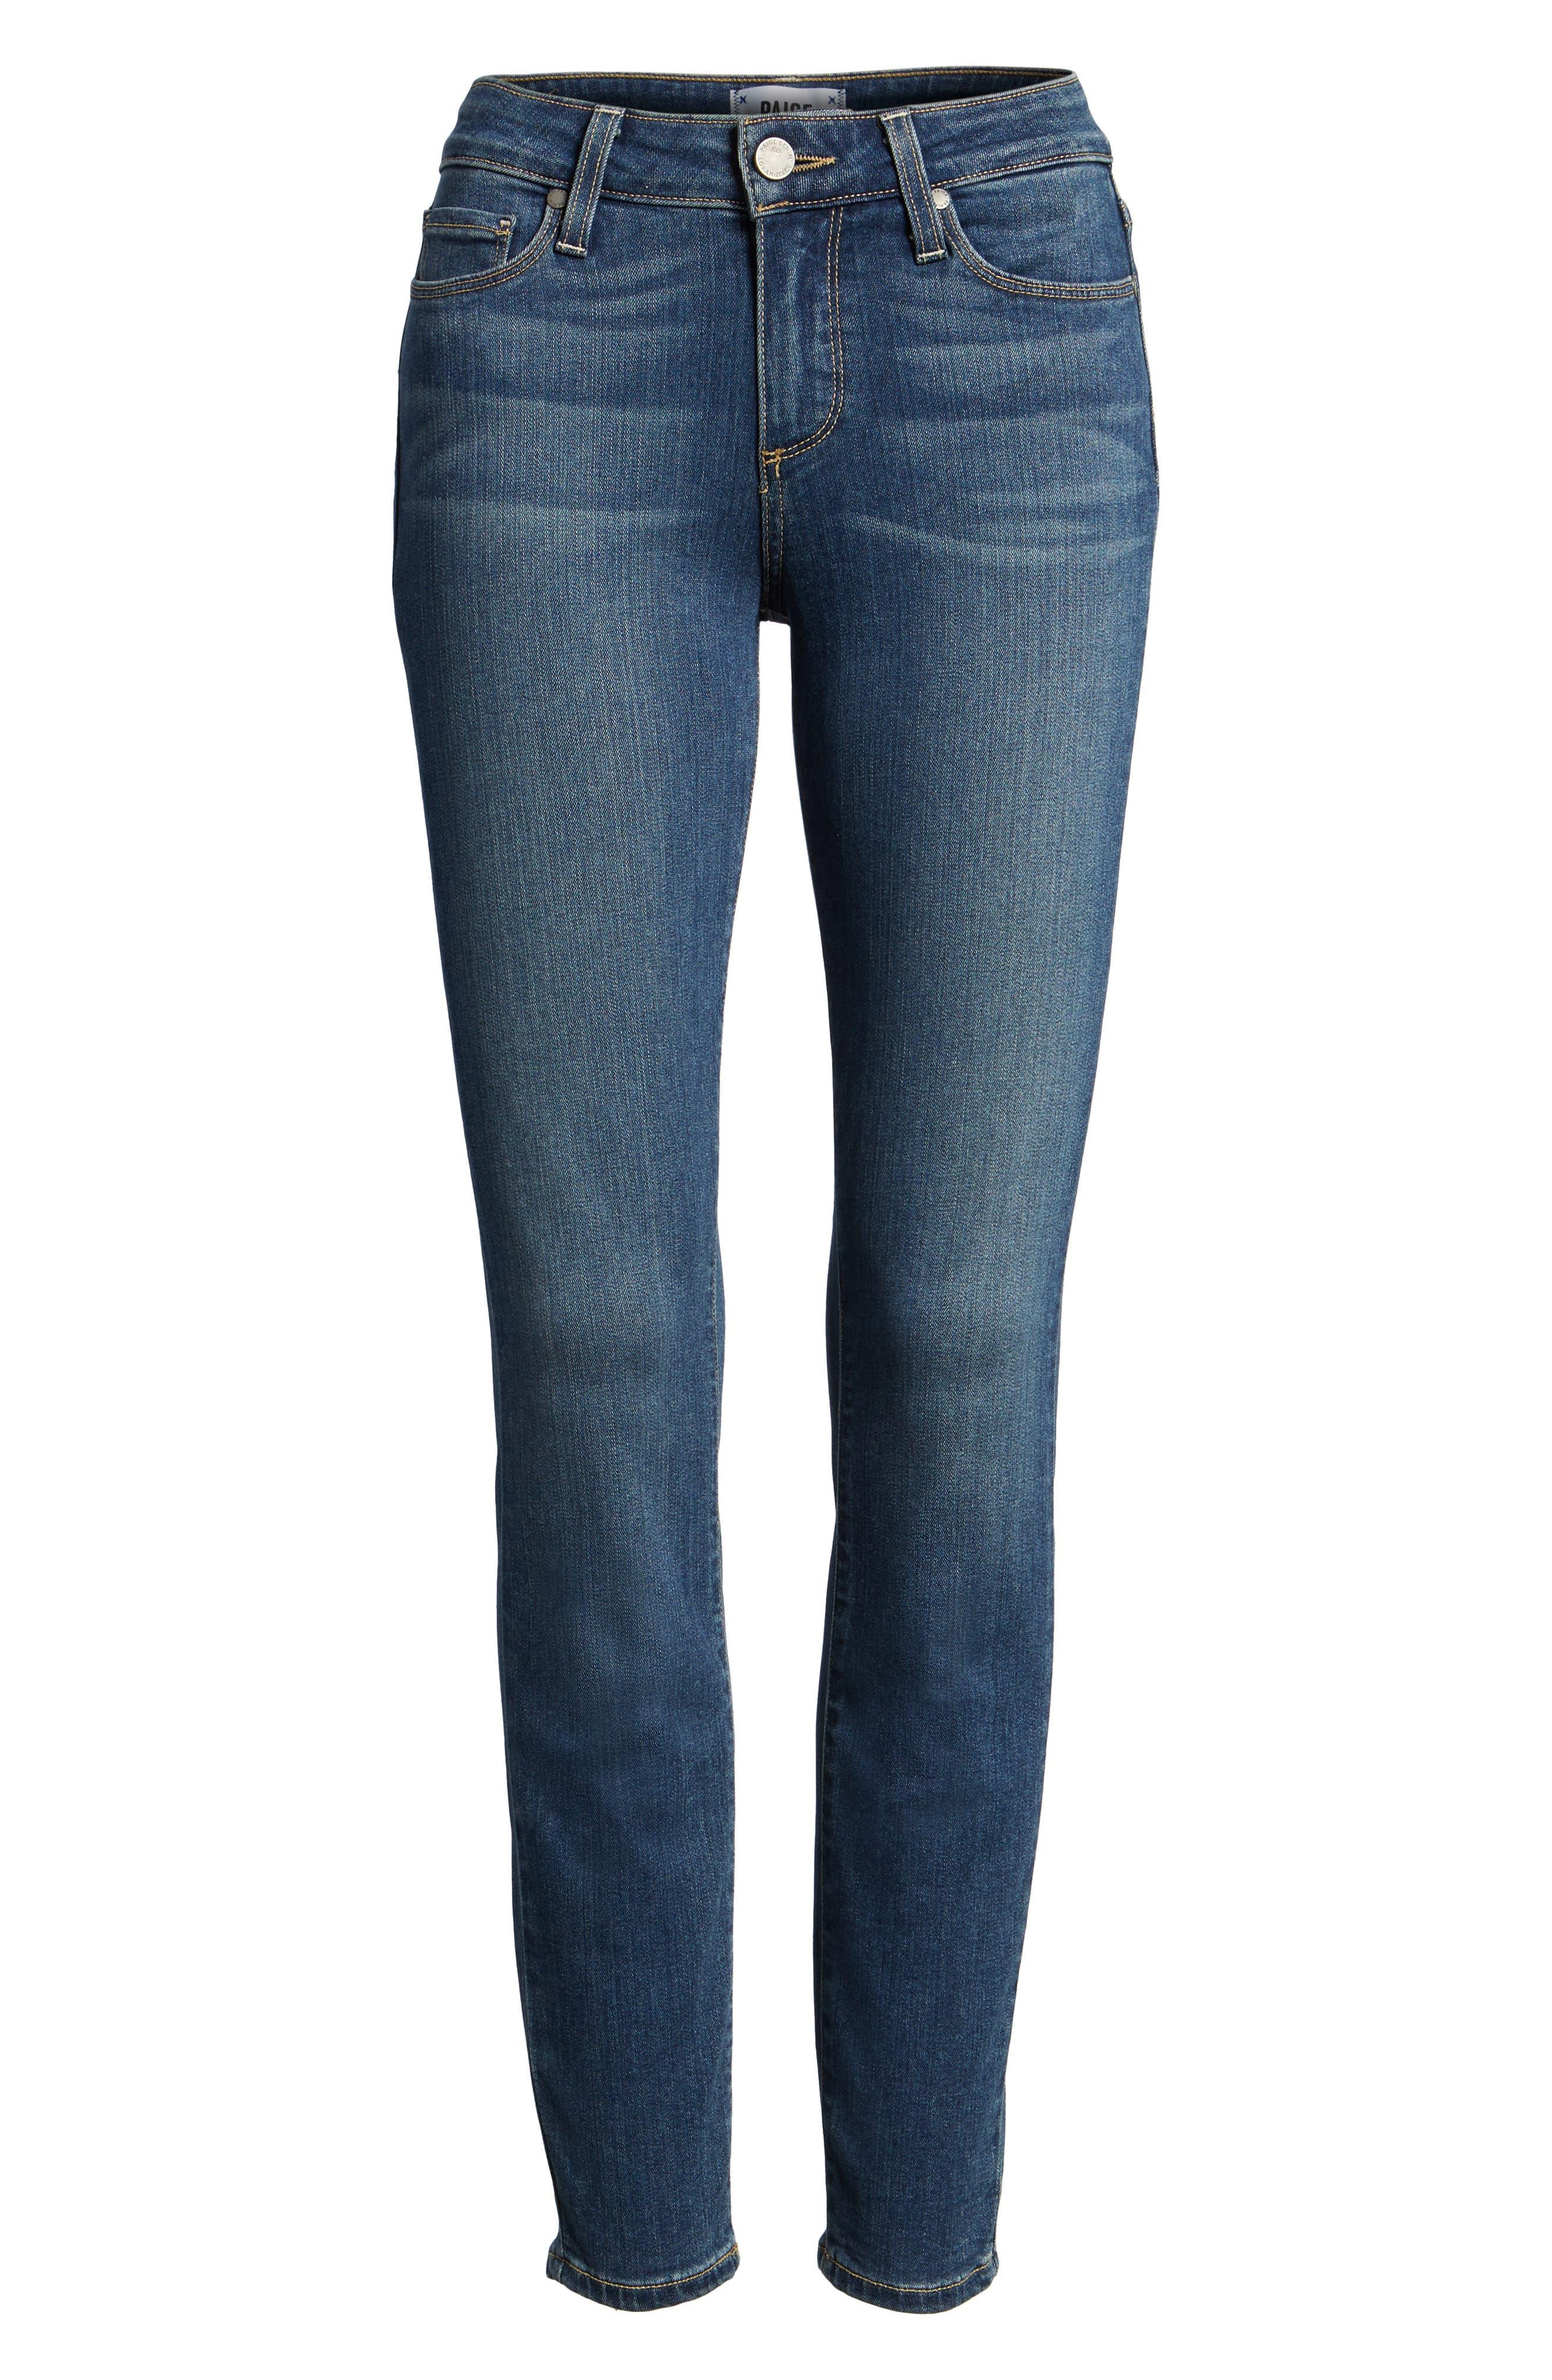 Transcend - Verdugo Ankle Skinny Jeans,                             Alternate thumbnail 7, color,                             TRISTAN